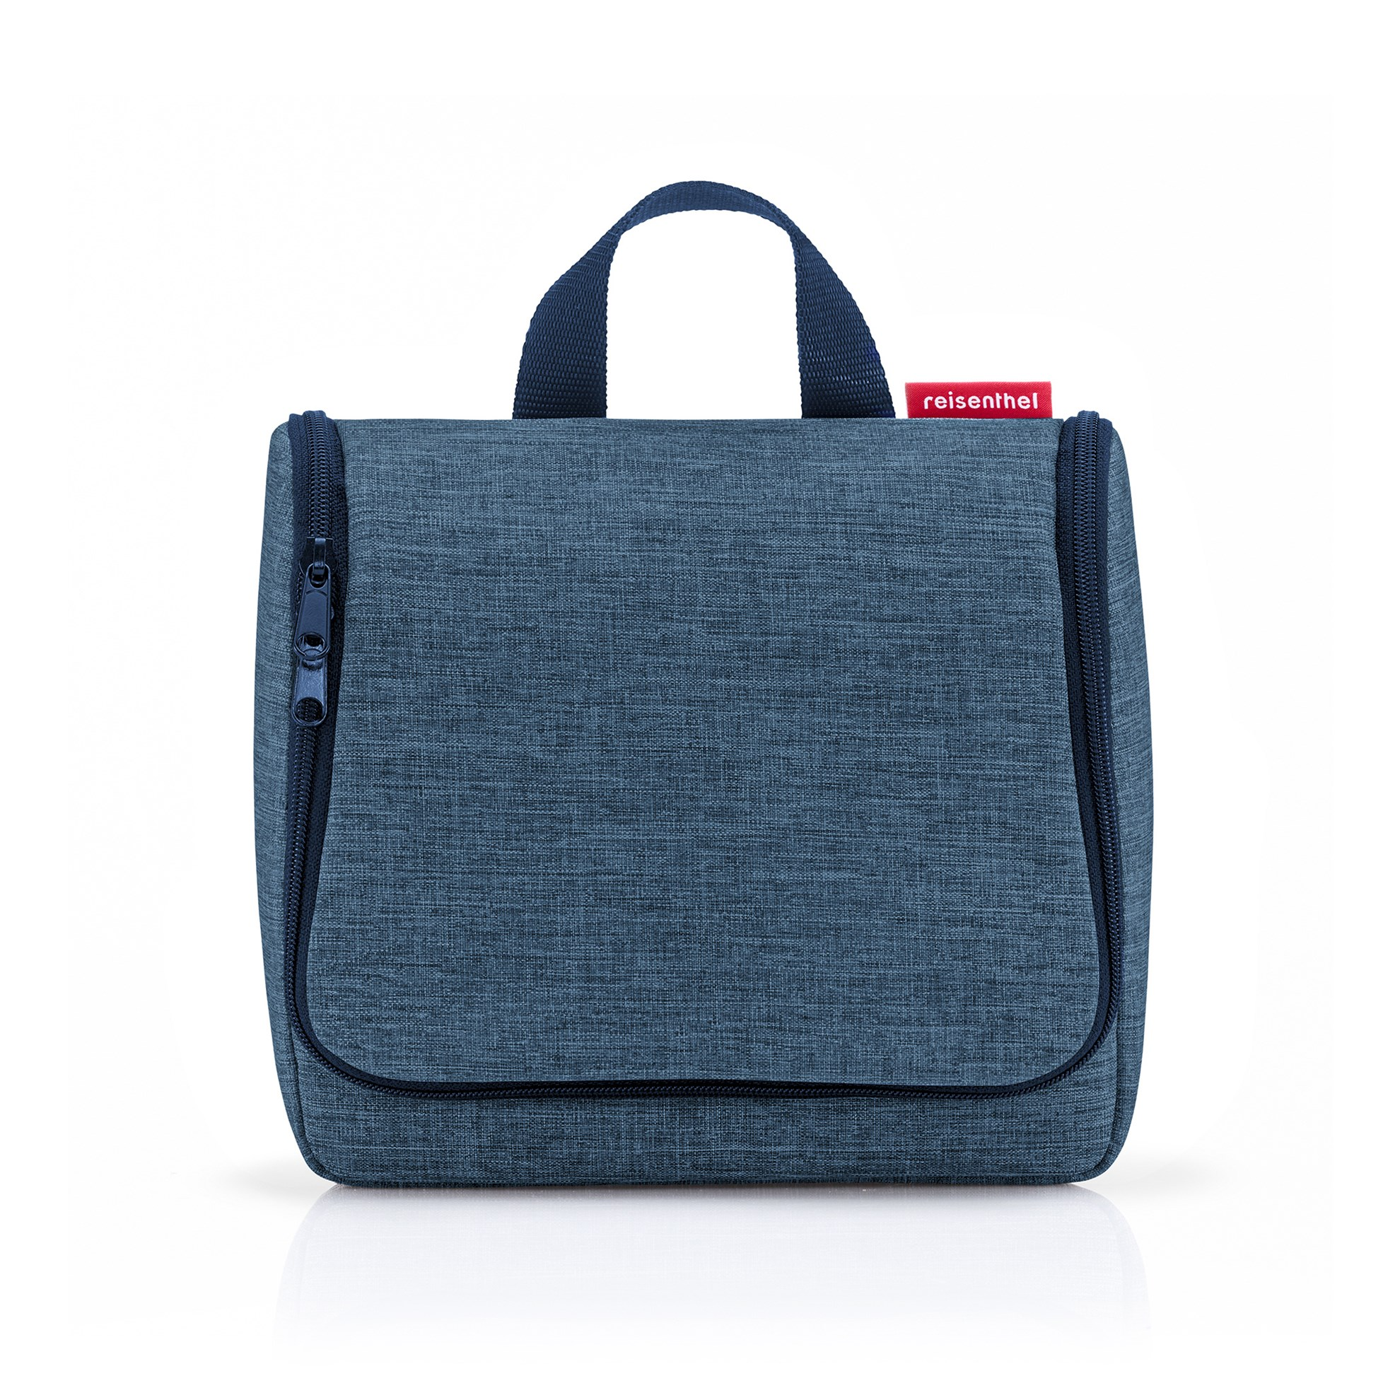 Kosmetická taška Toiletbag twist blue_1